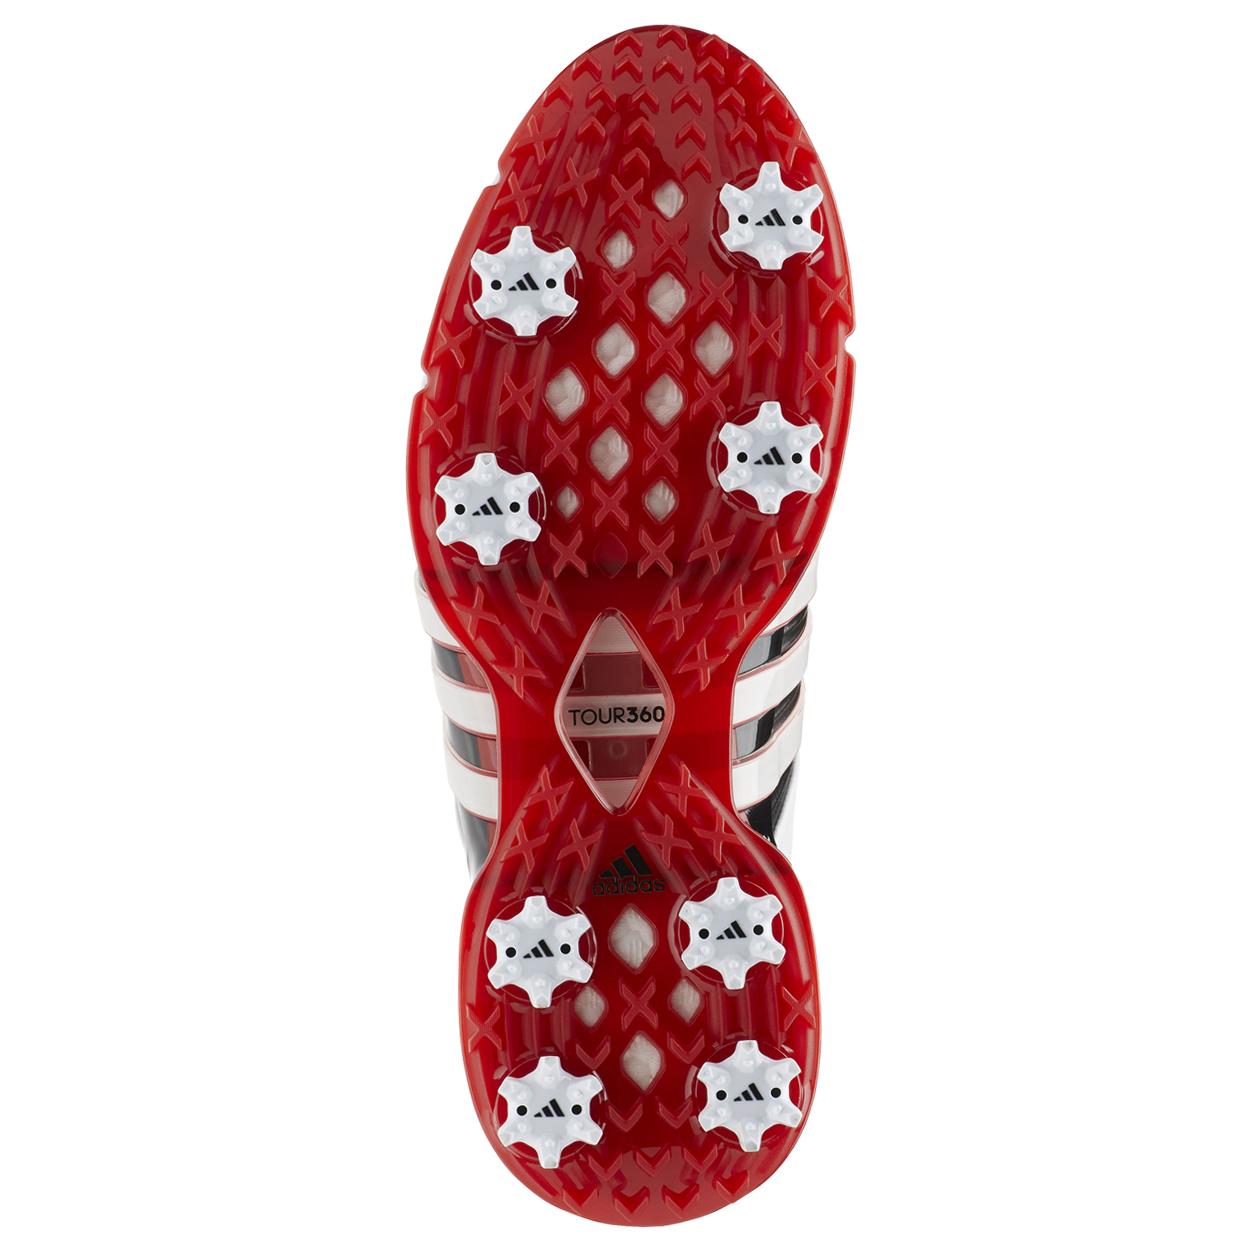 Adidas-Men-039-s-Tour-360-XT-Leather-Replaceable-Soft-Spike-Golf-Shoe-Brand-New thumbnail 7